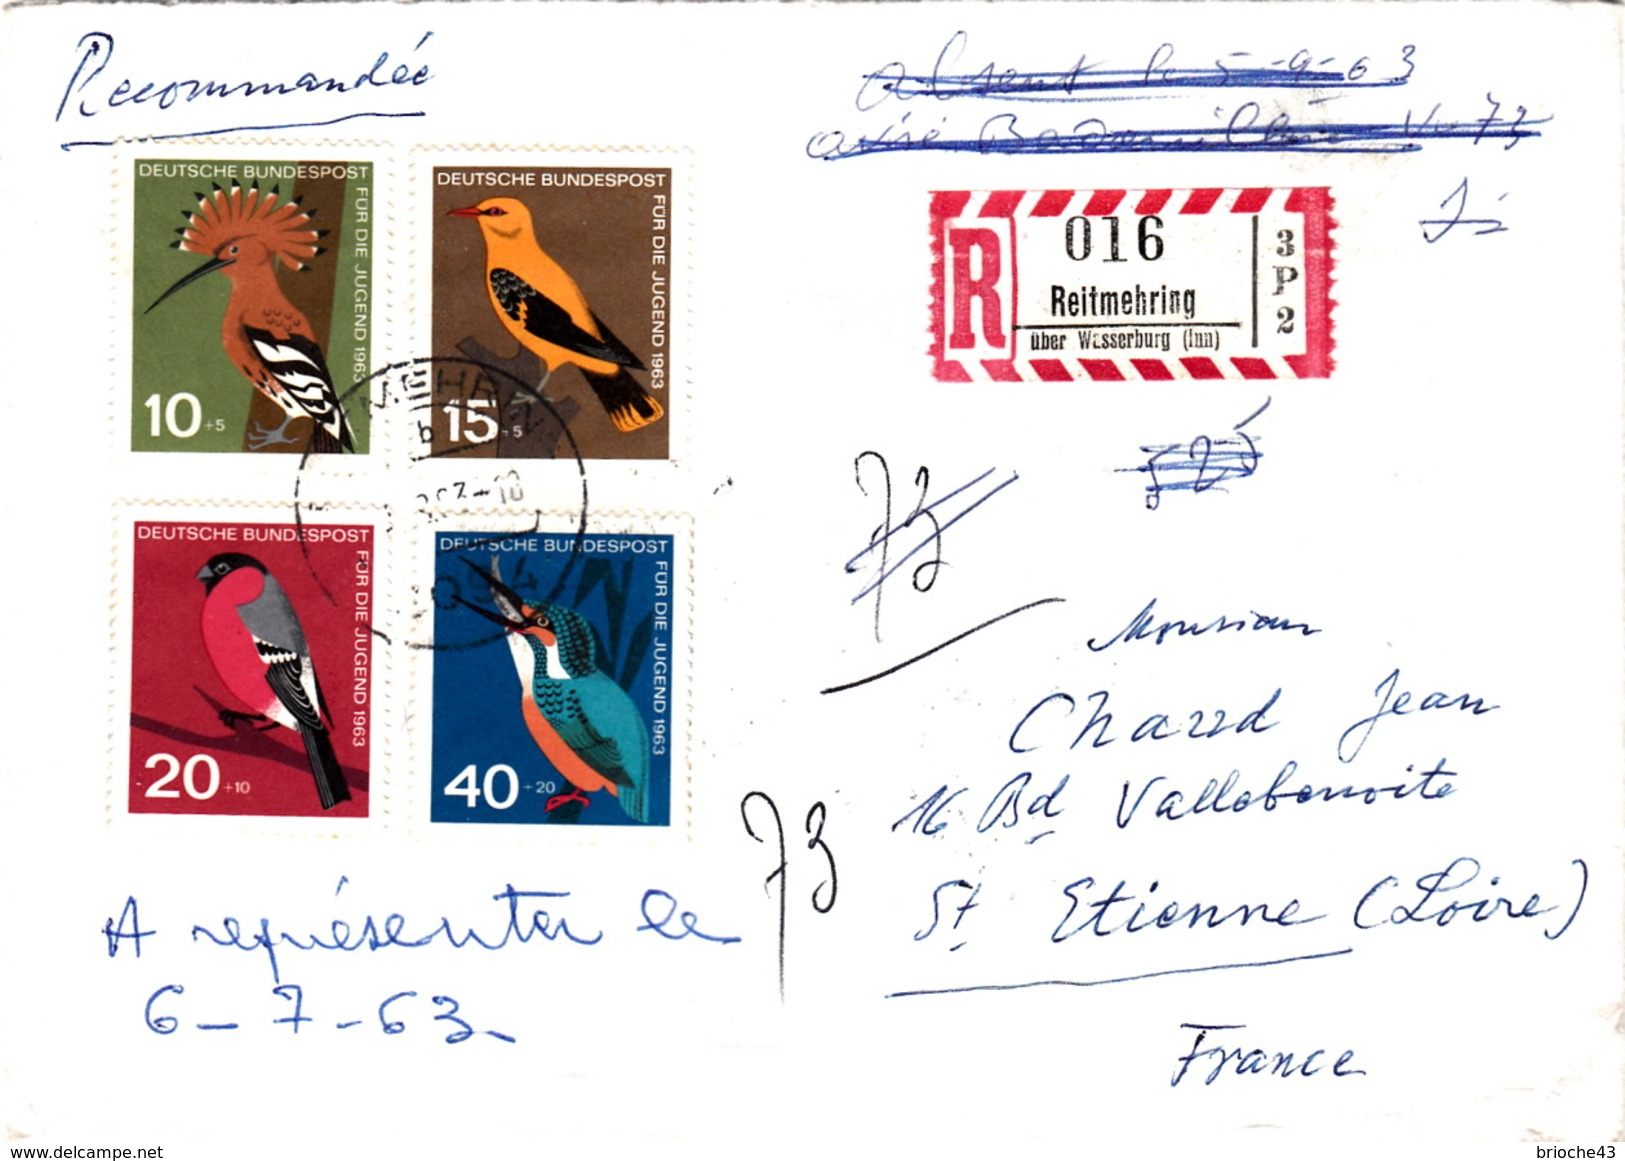 ALLEMAGNE   COVER BIRD -  RECOMMANDE REIFMEHRING- OBLITERATION RONDE 1963 - Birds